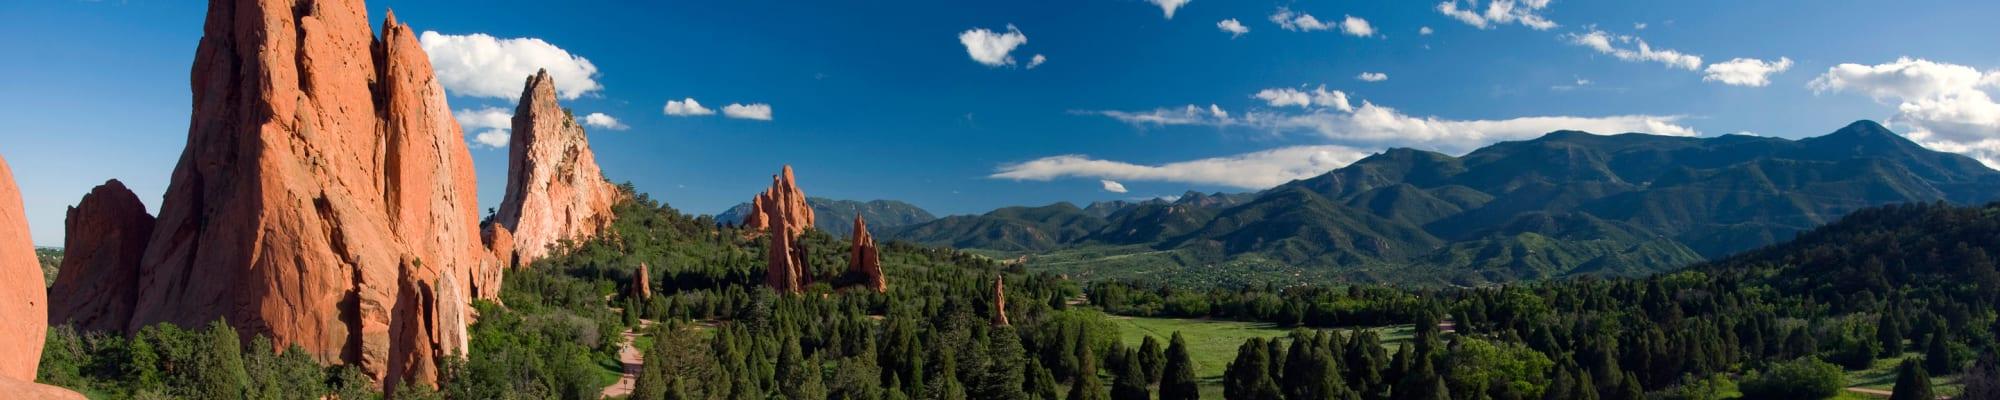 Schedule a tour of Enchanted Springs Apartments in Colorado Springs, Colorado